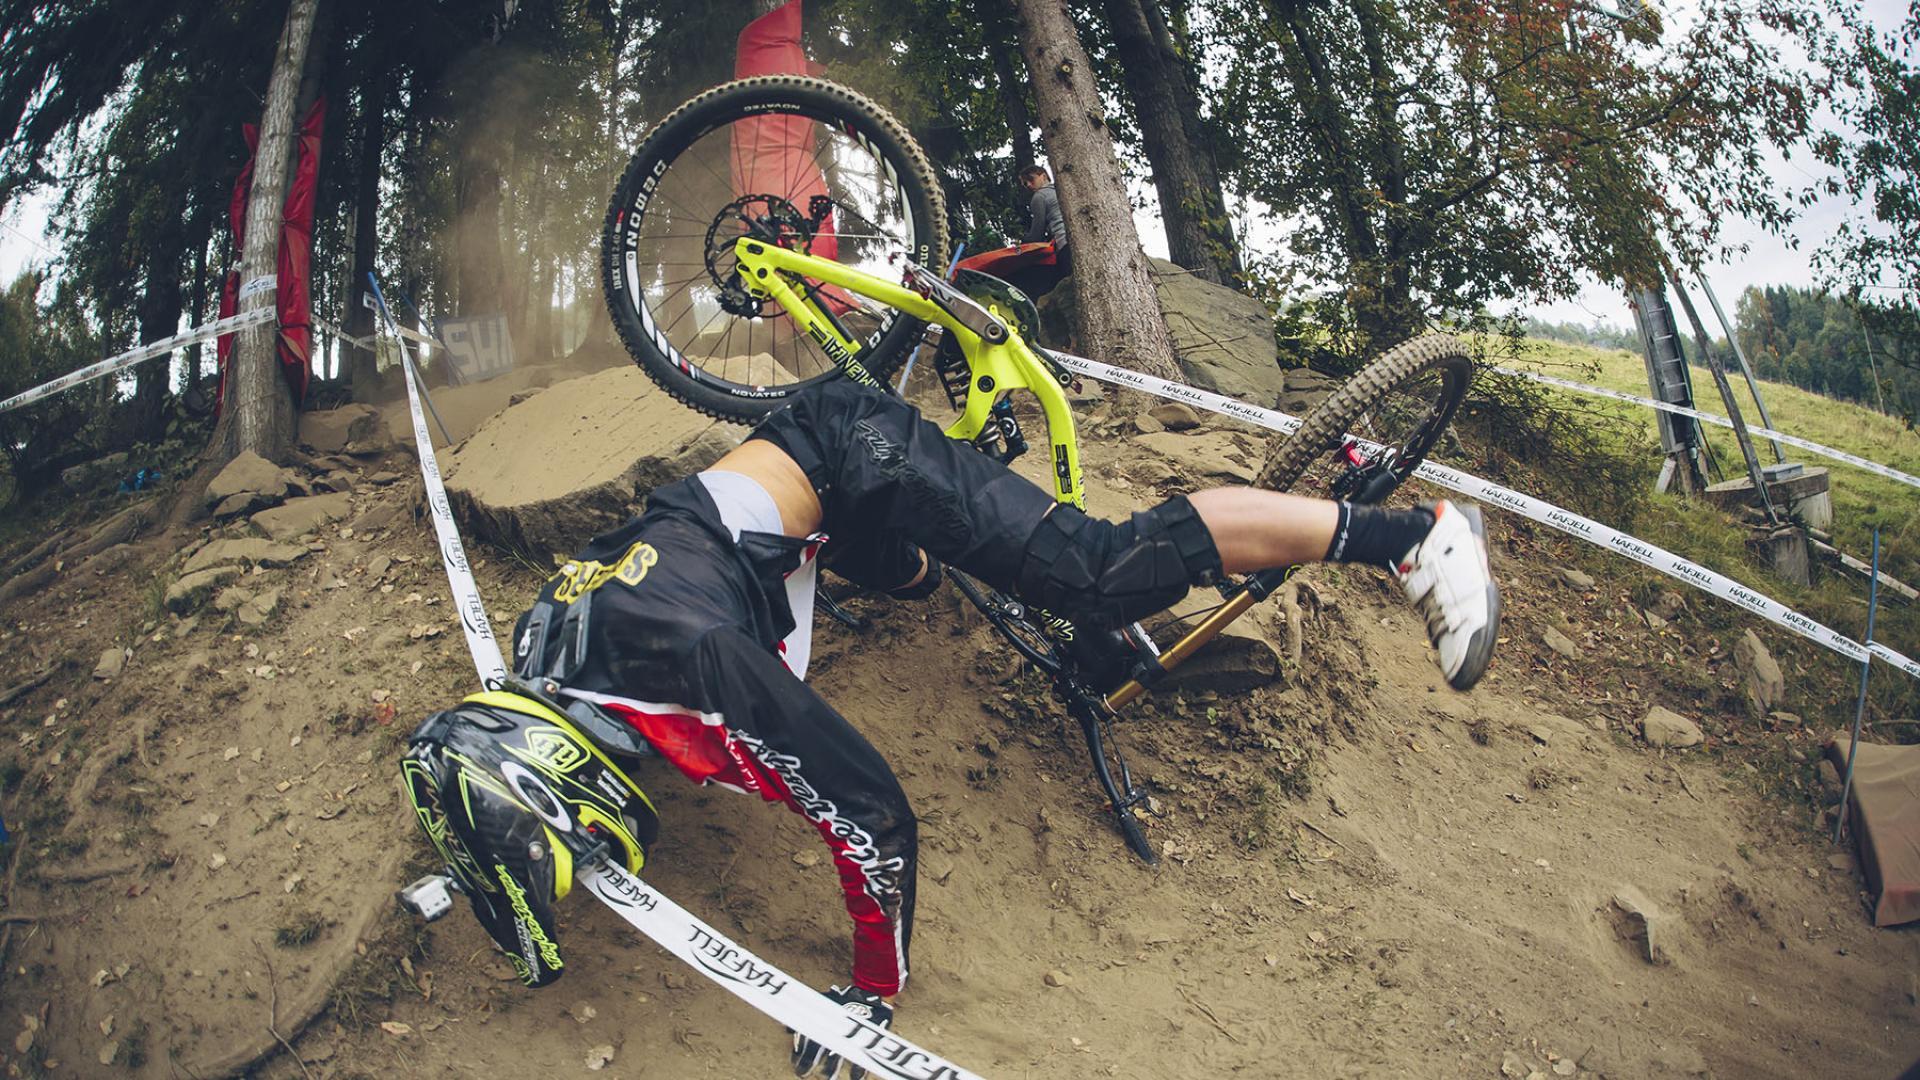 How to Treat Mountain Bike Injuries